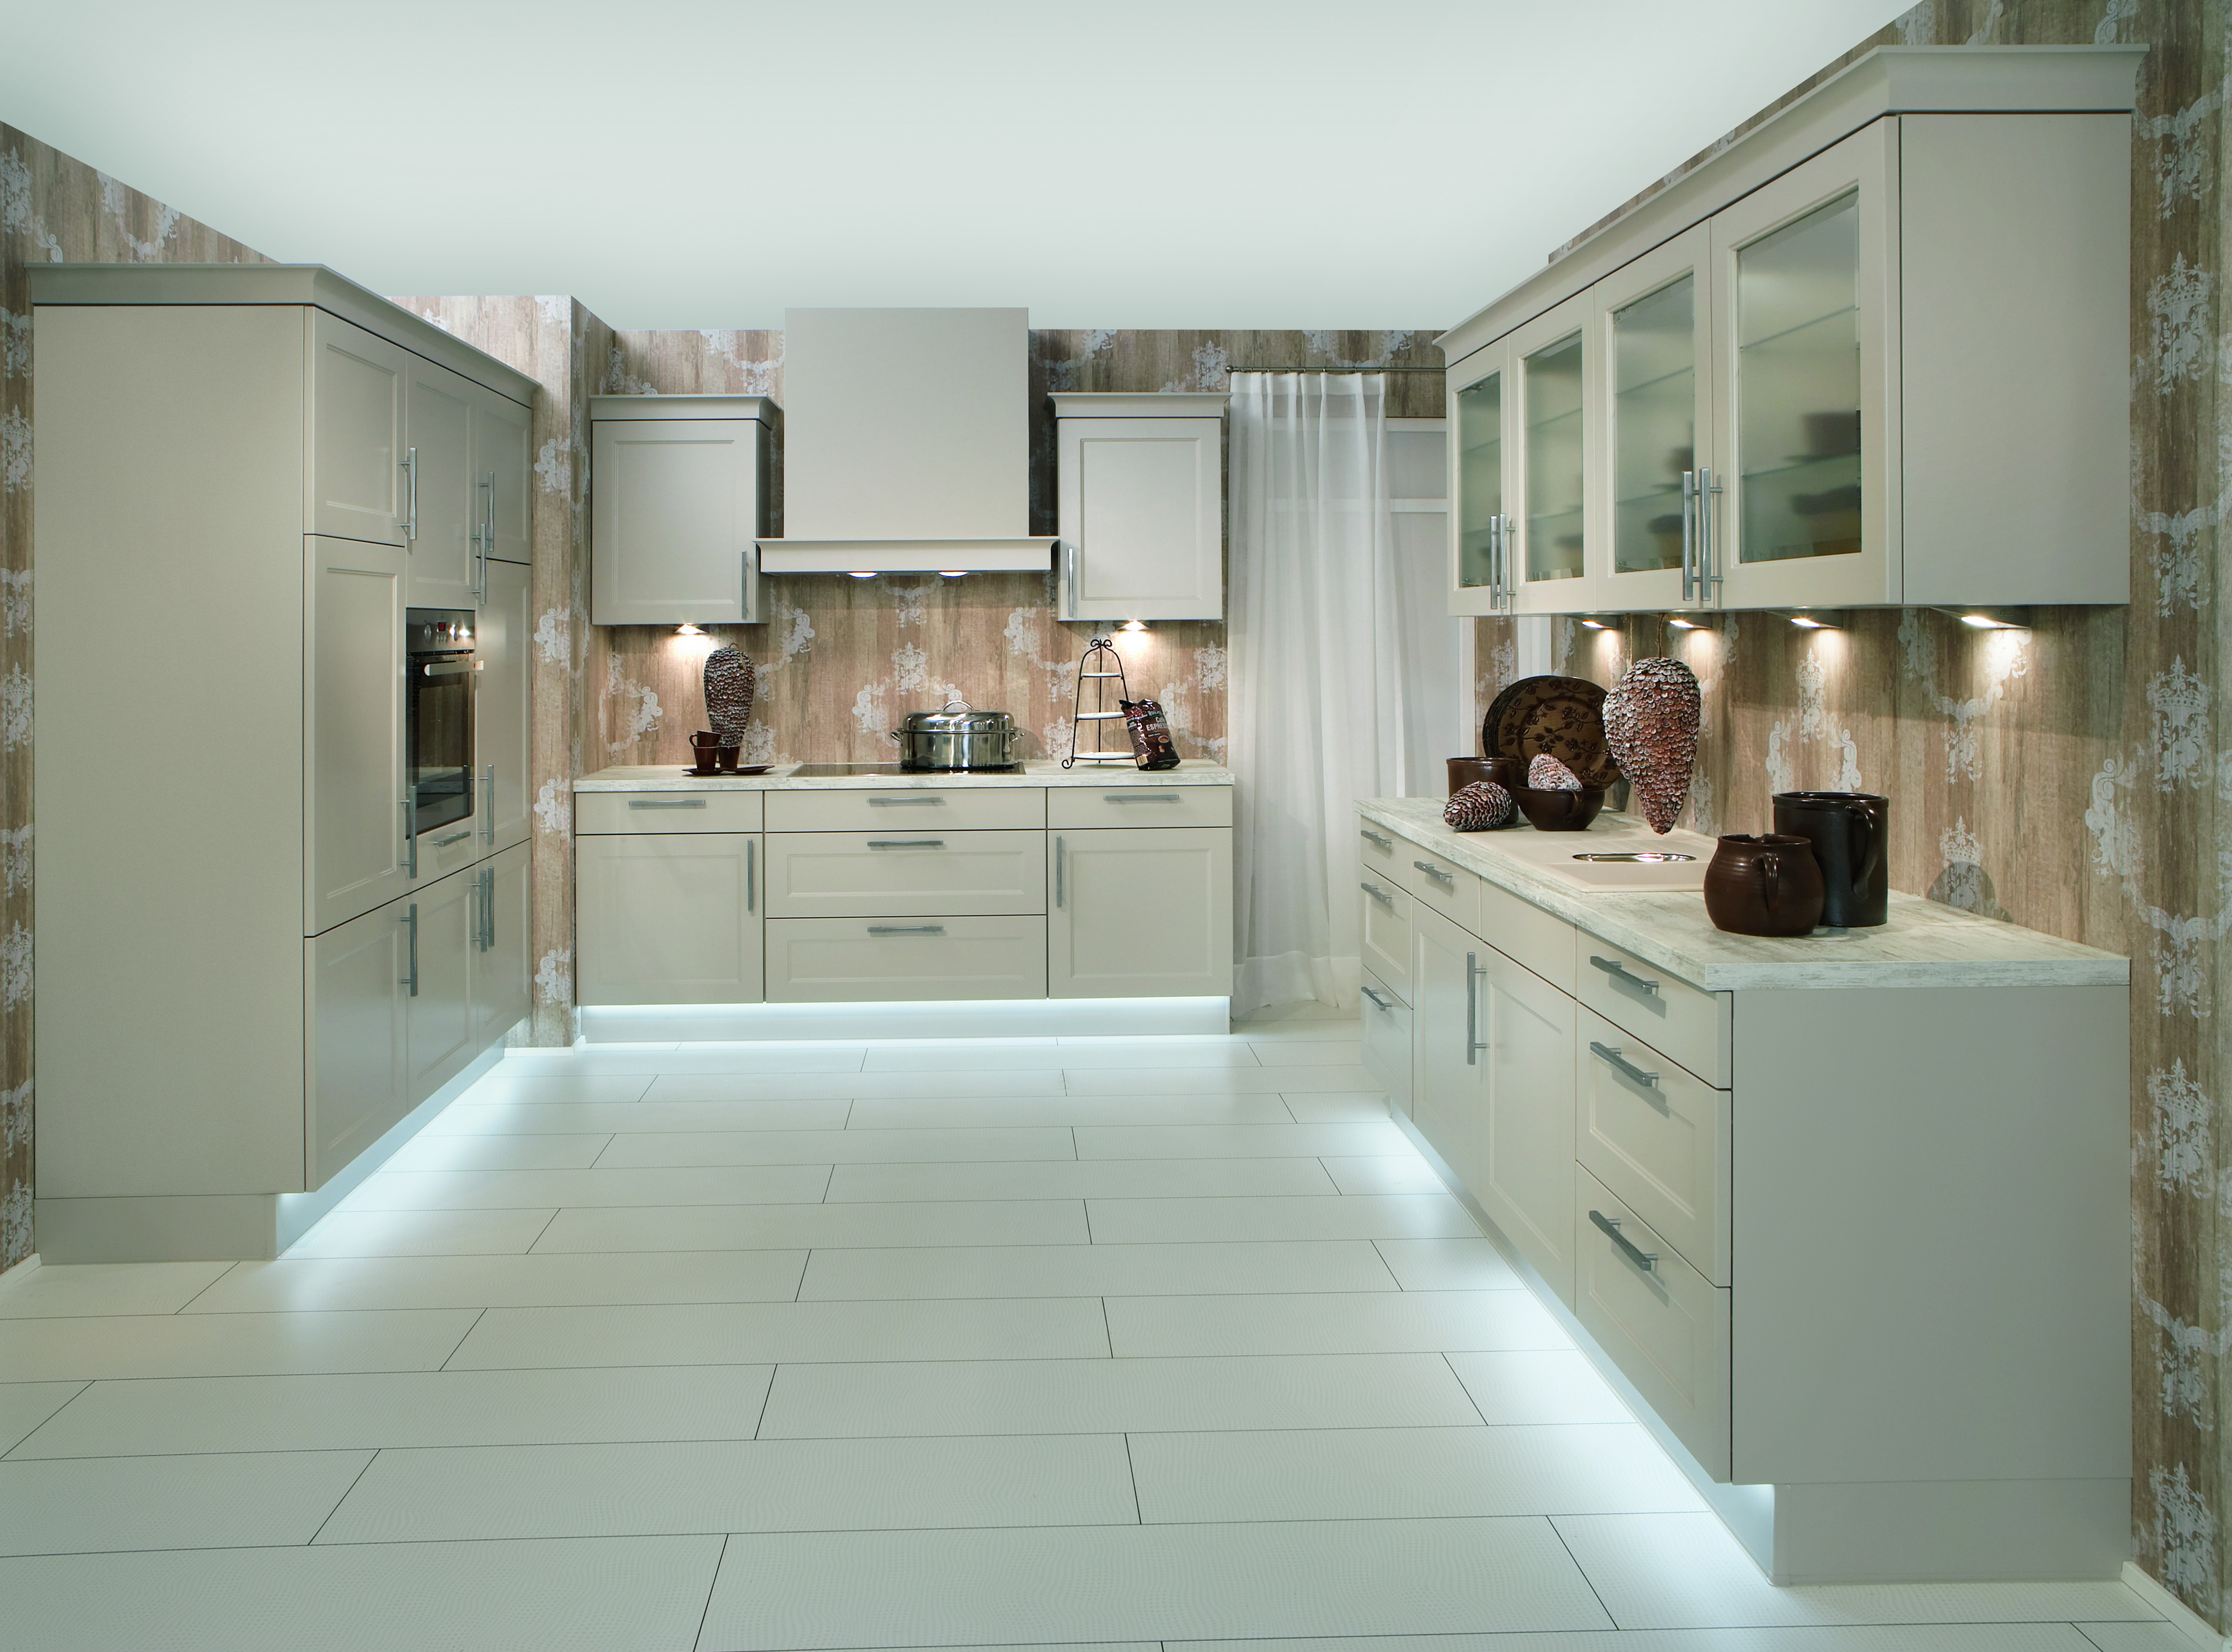 Chalet Style Kitchen